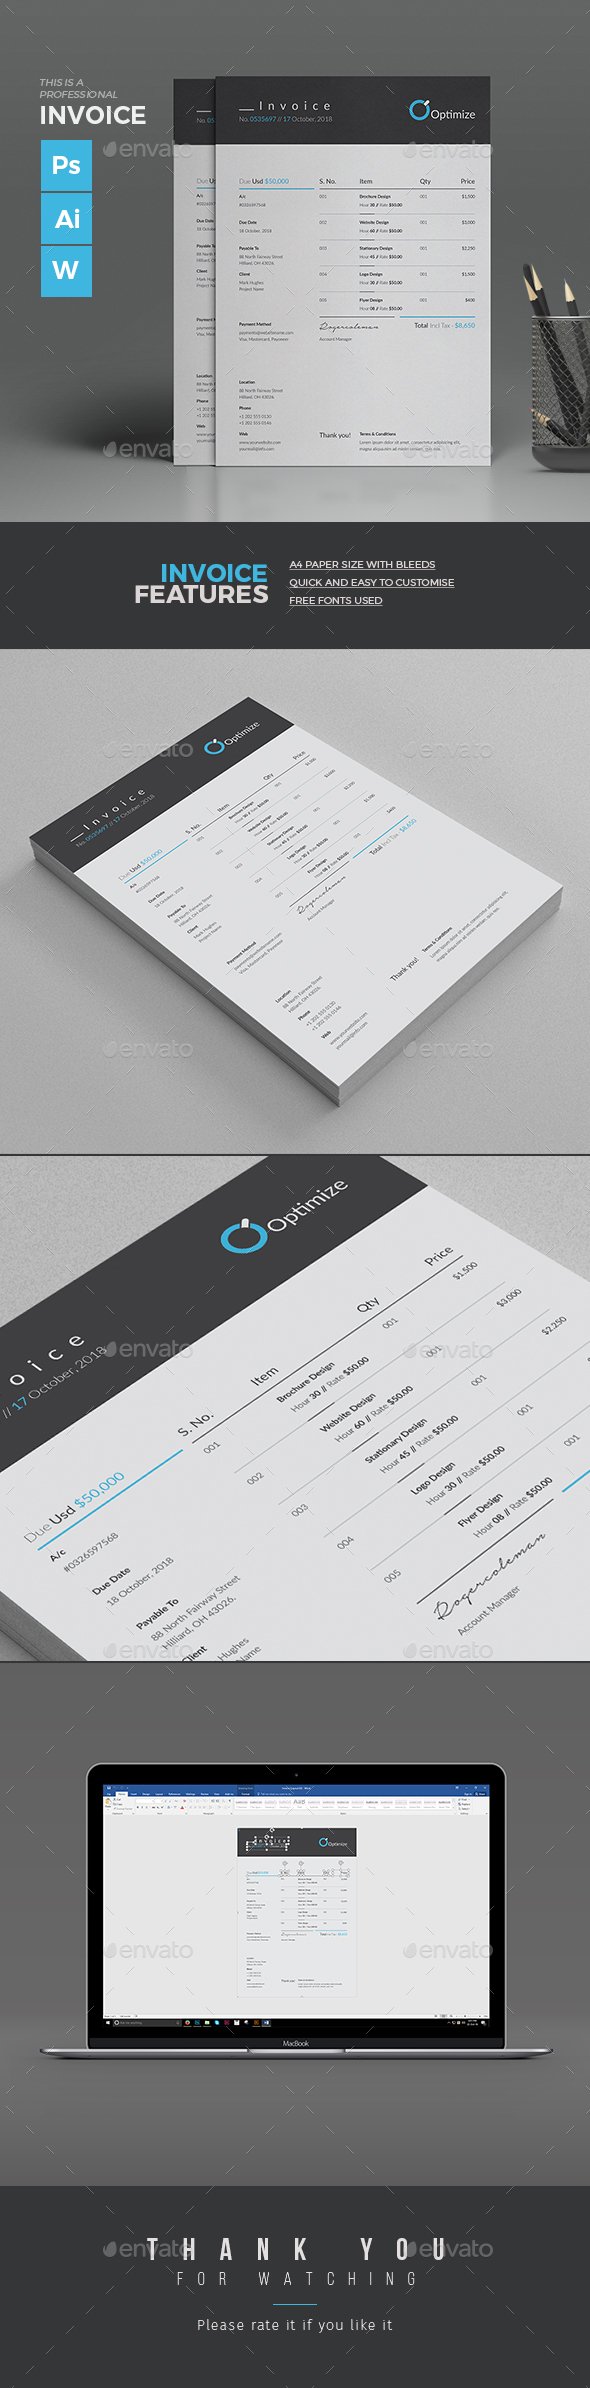 Minimal Invoice Template Design MS Word